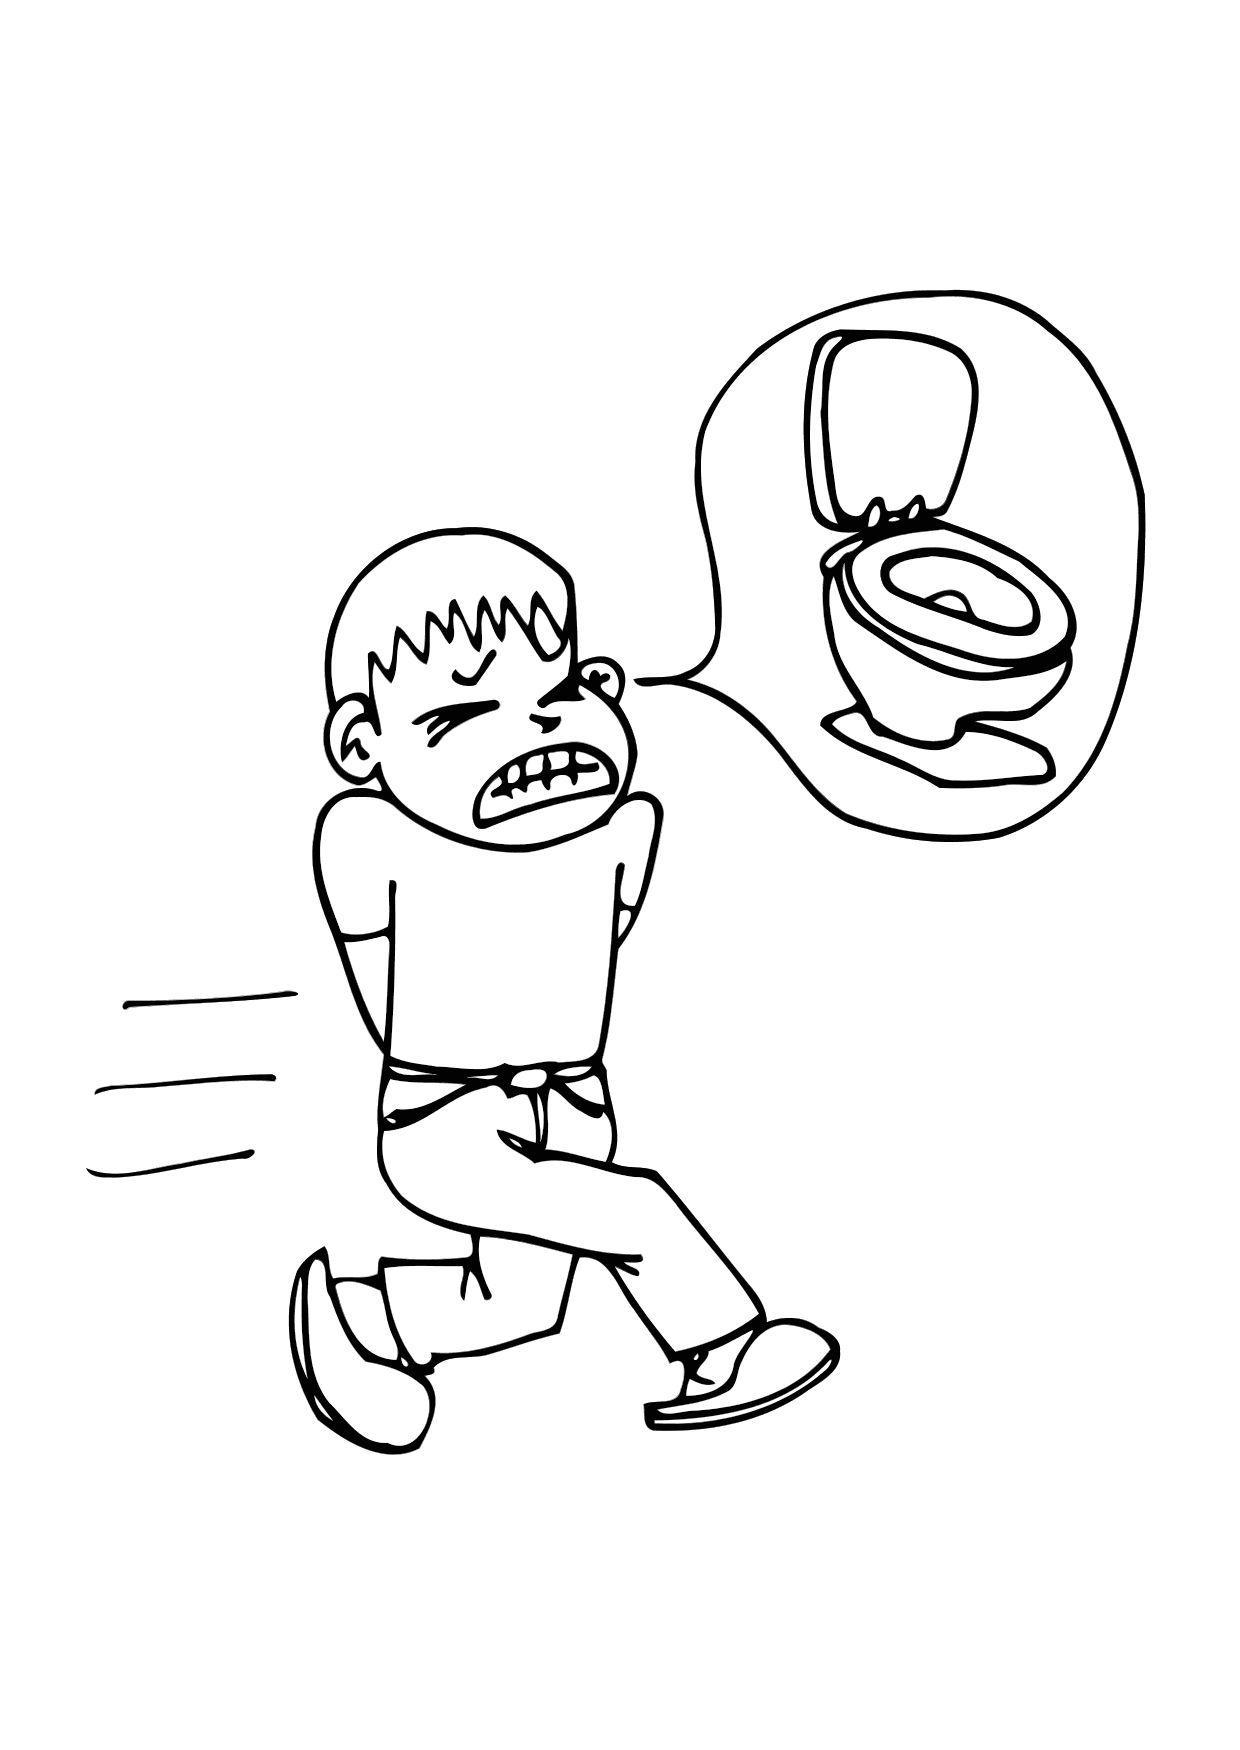 Dibujo para colorear Diarrea - Img 11789